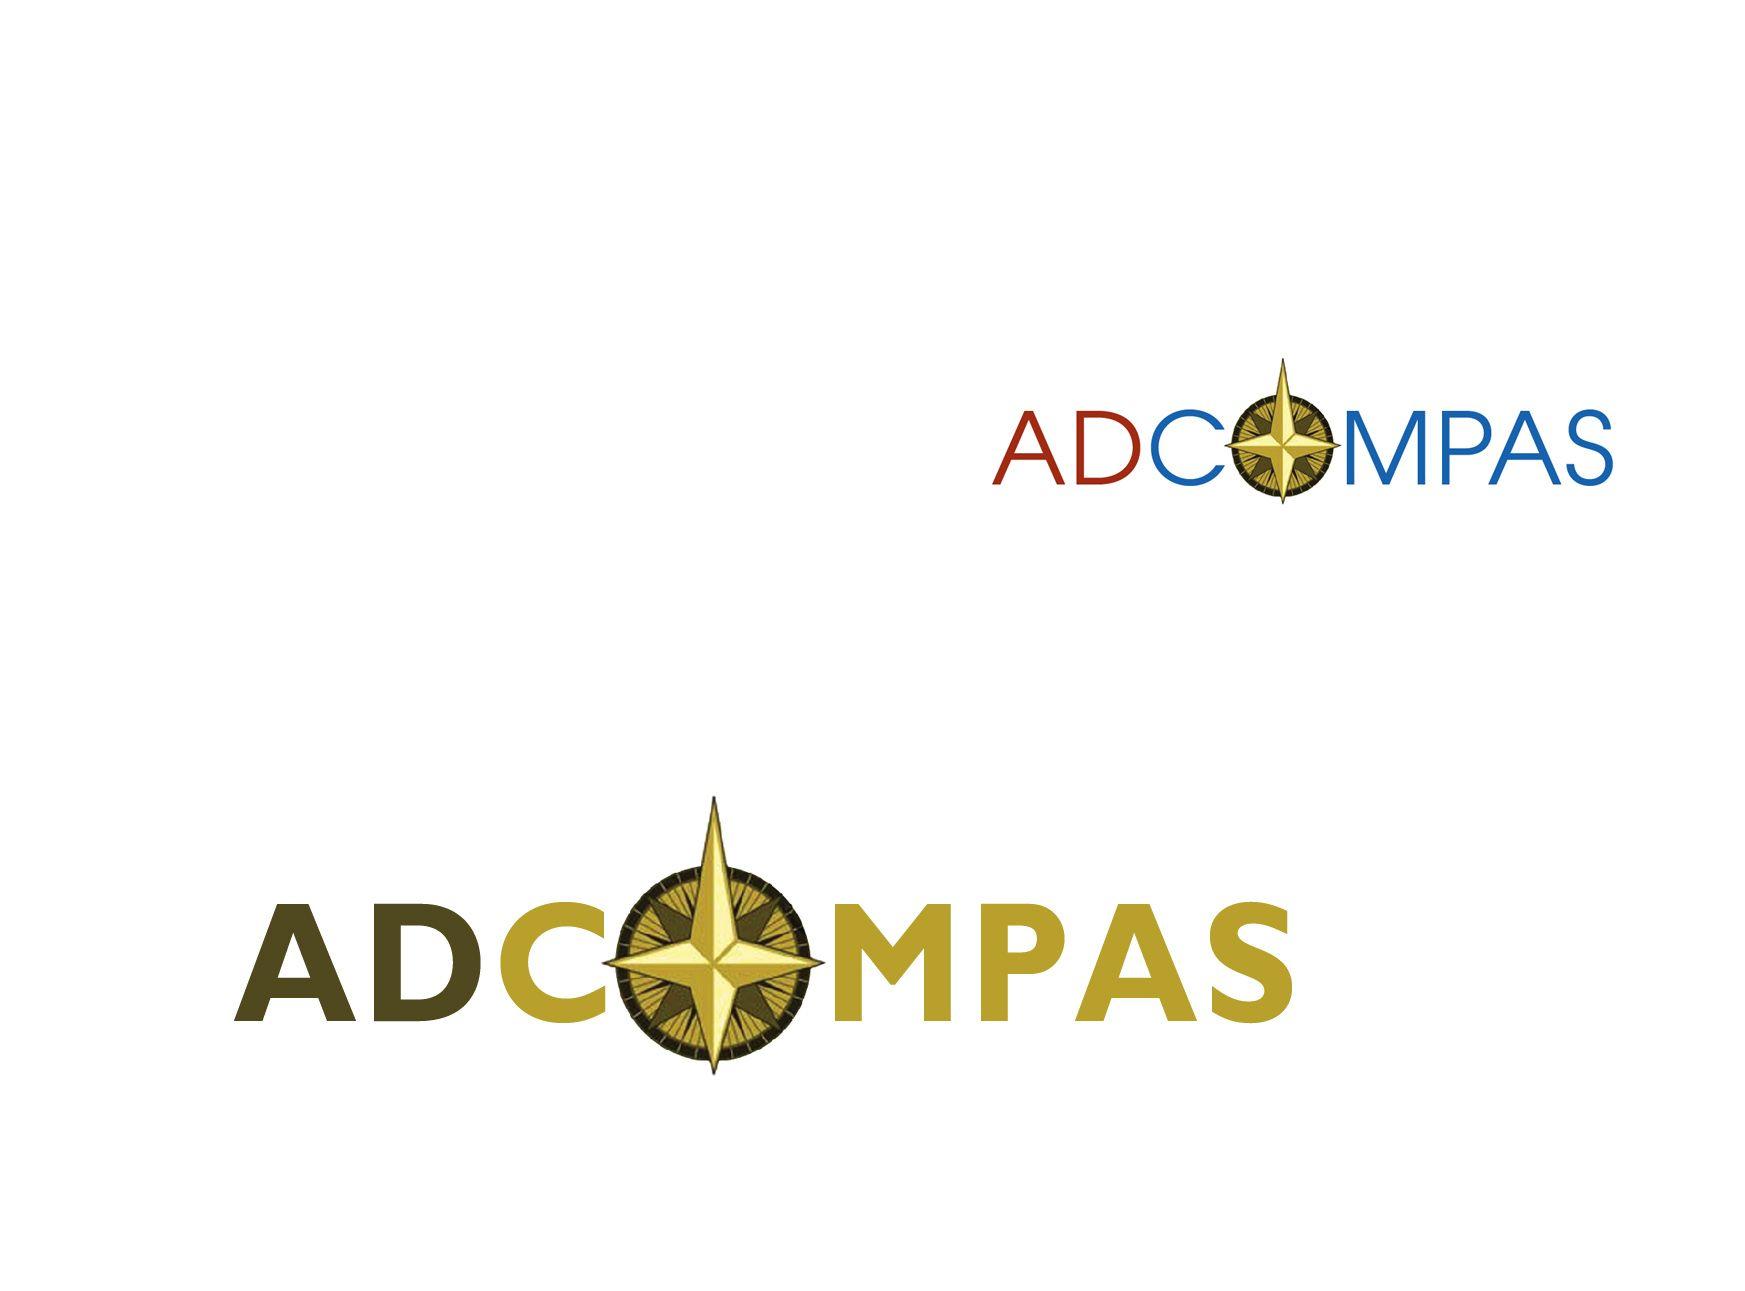 Нужен логотип для сайта рекламной компании СPA  - дизайнер BRUINISHE